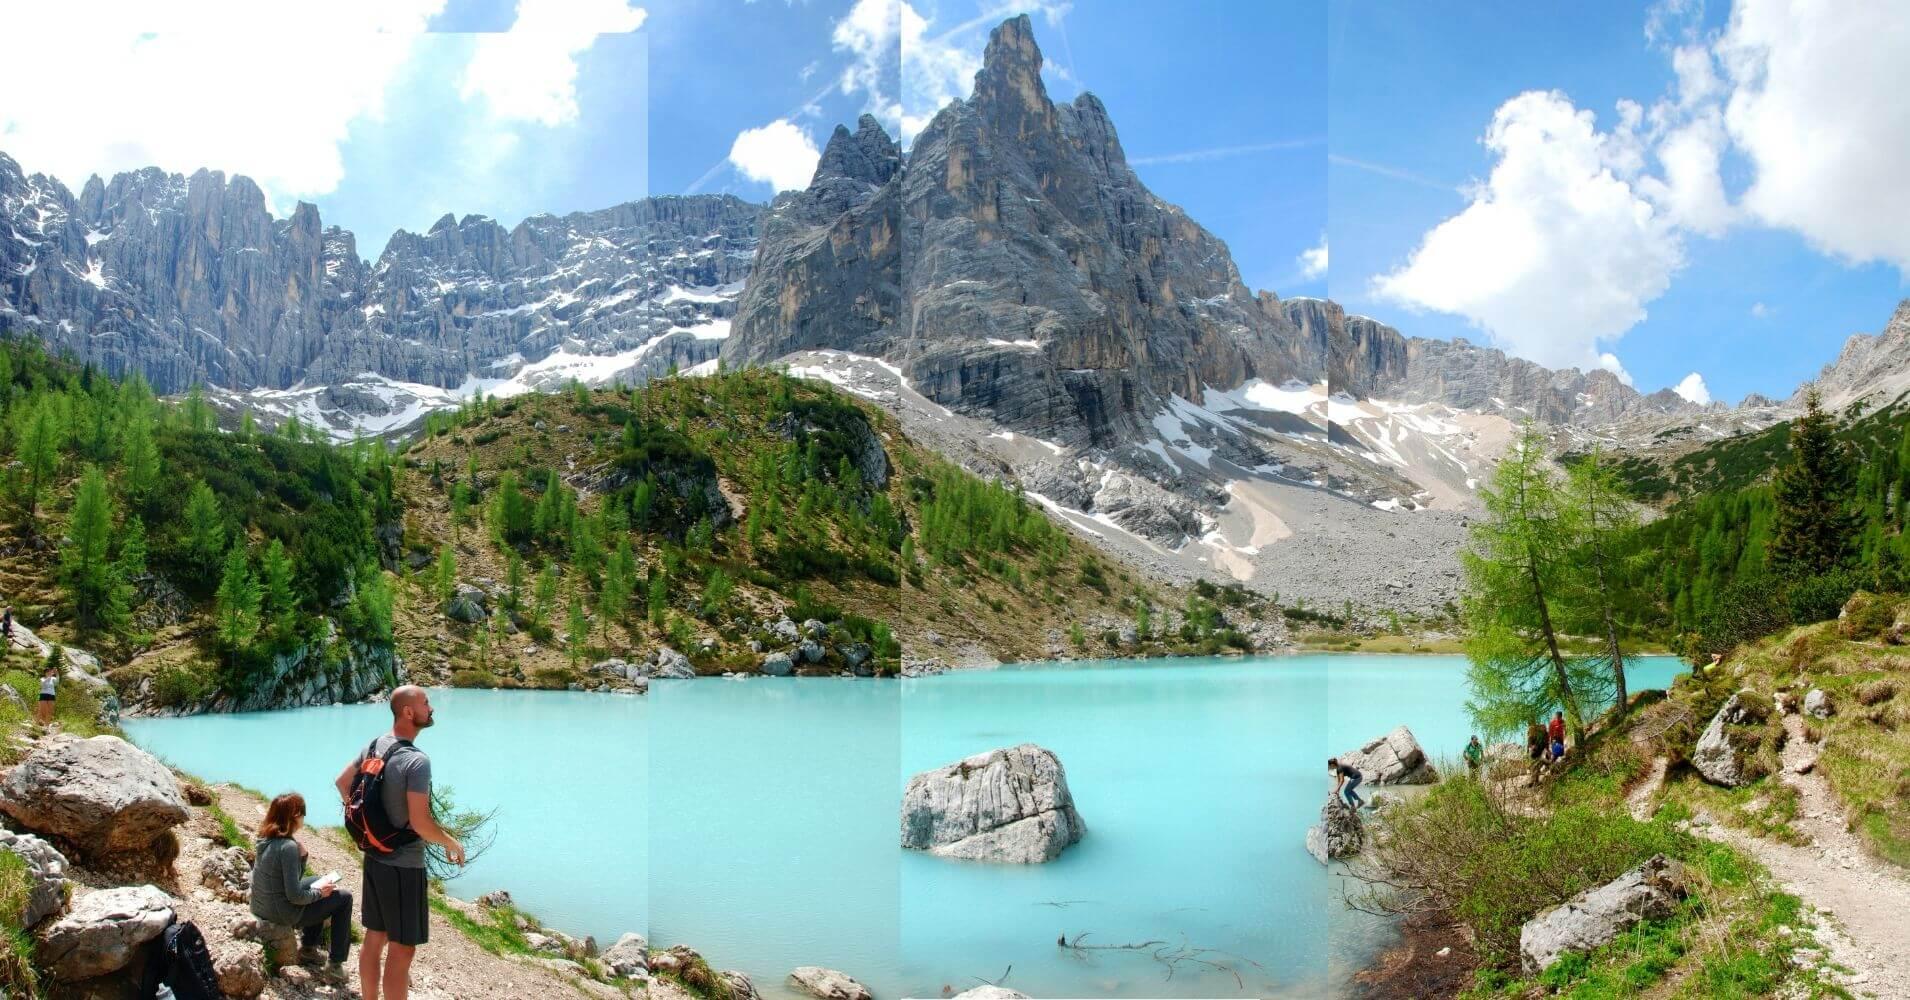 Lago di Sorapis en Cortina d' Ampezzo. Dolomitas, Belluno. Véneto. Italia.